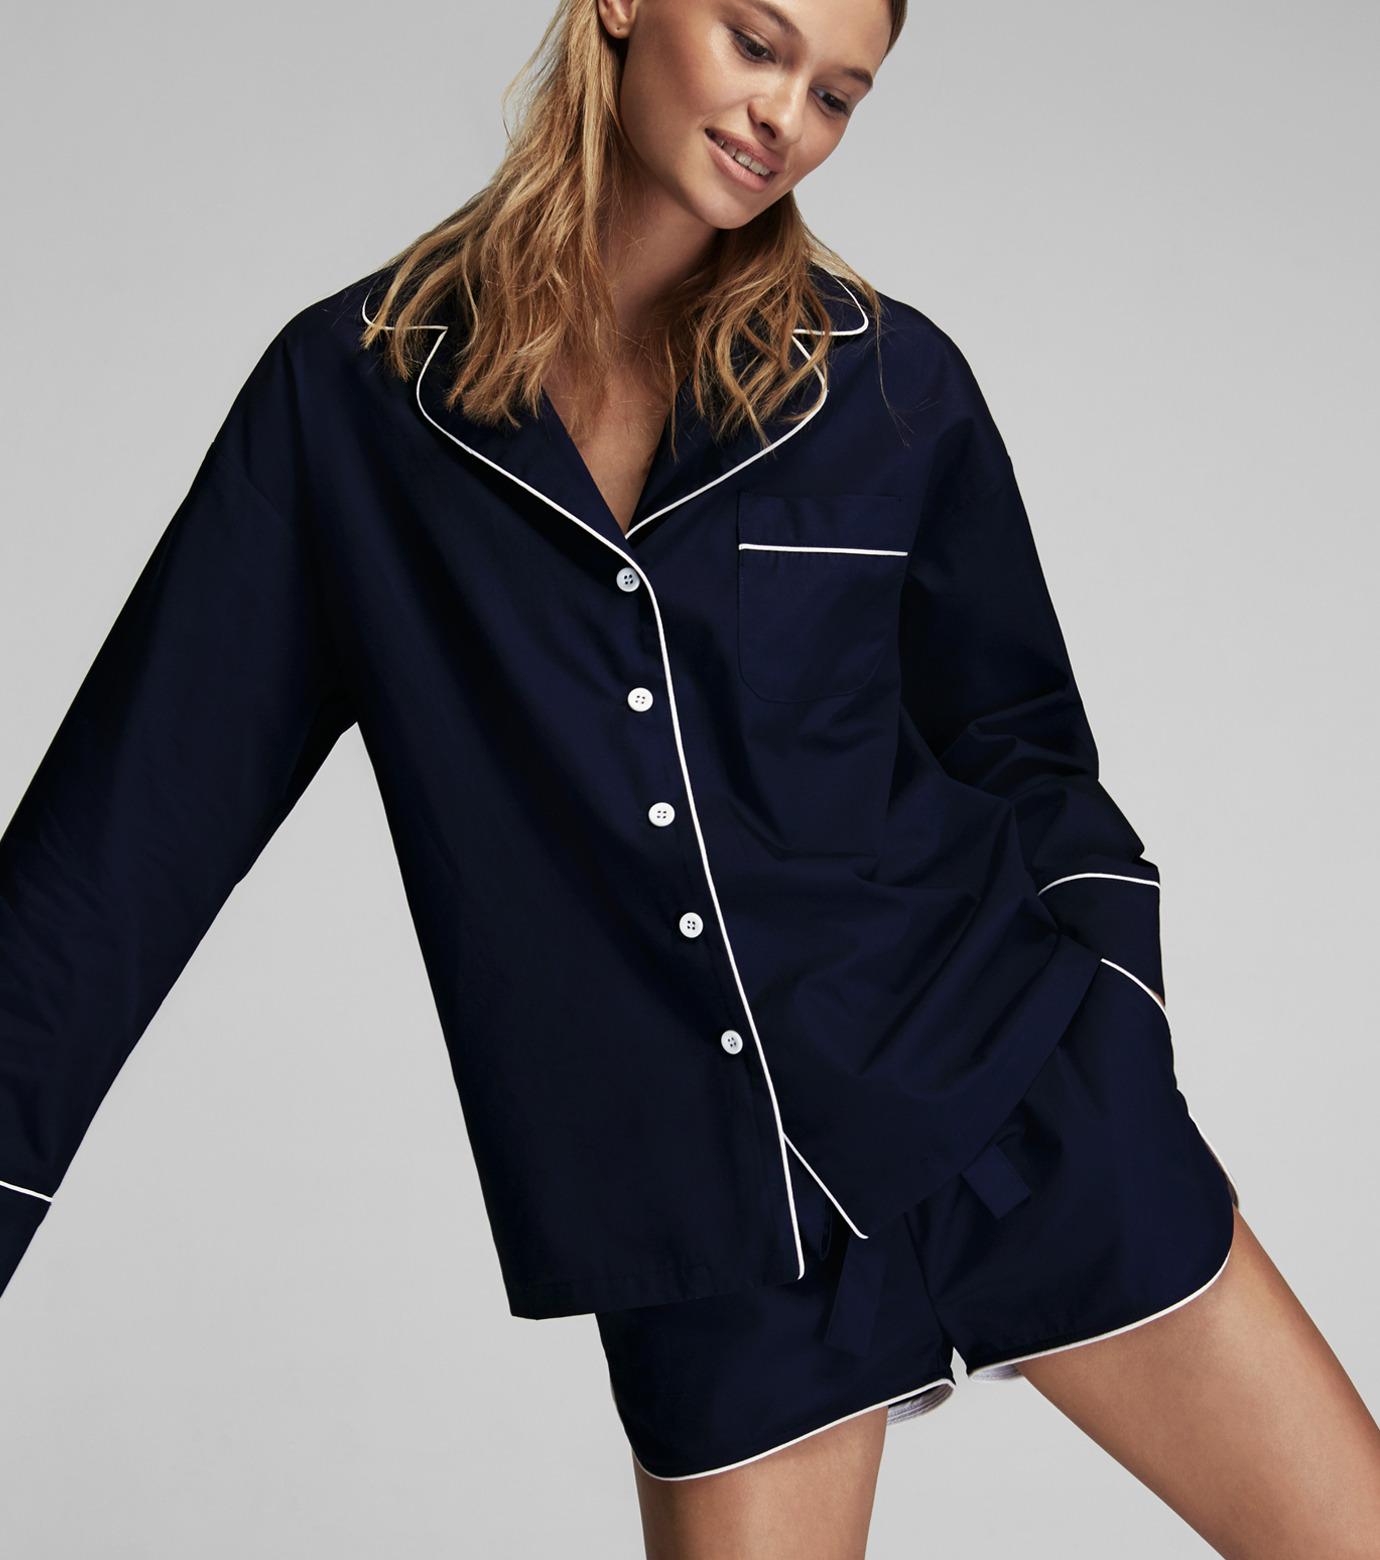 SLEEPER(スリーパー)のRoyal Blue Pajama Set with Shorts-NAVY(LINGERIE/LINGERIE)-BC0045-93 拡大詳細画像3